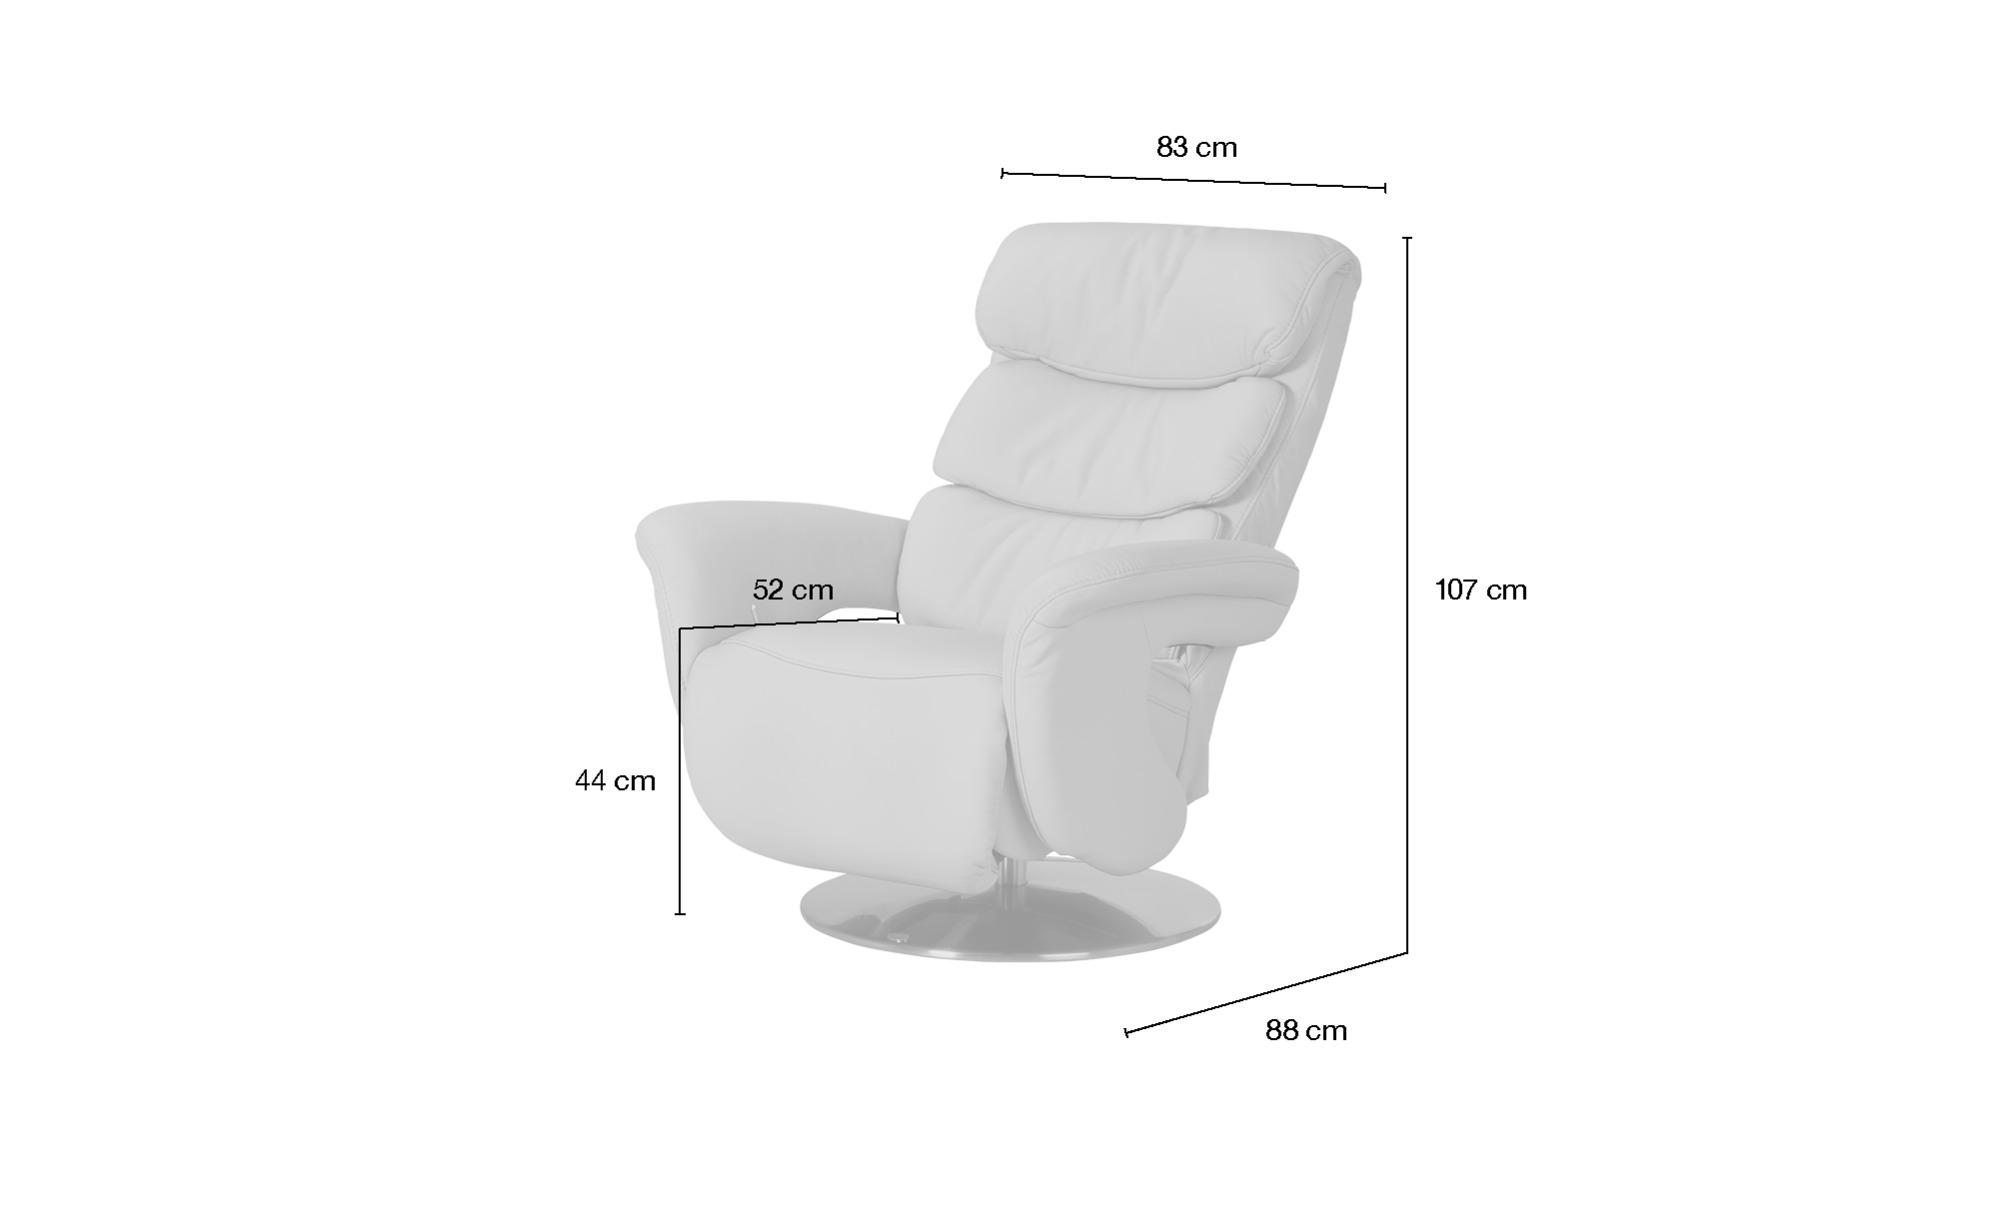 himolla Leder-Relaxsessel beige - Leder 7228 ¦ beige ¦ Maße (cm): B: 83 H: 107 T: 88 Polstermöbel > Sessel > Fernsehsessel - Höffner